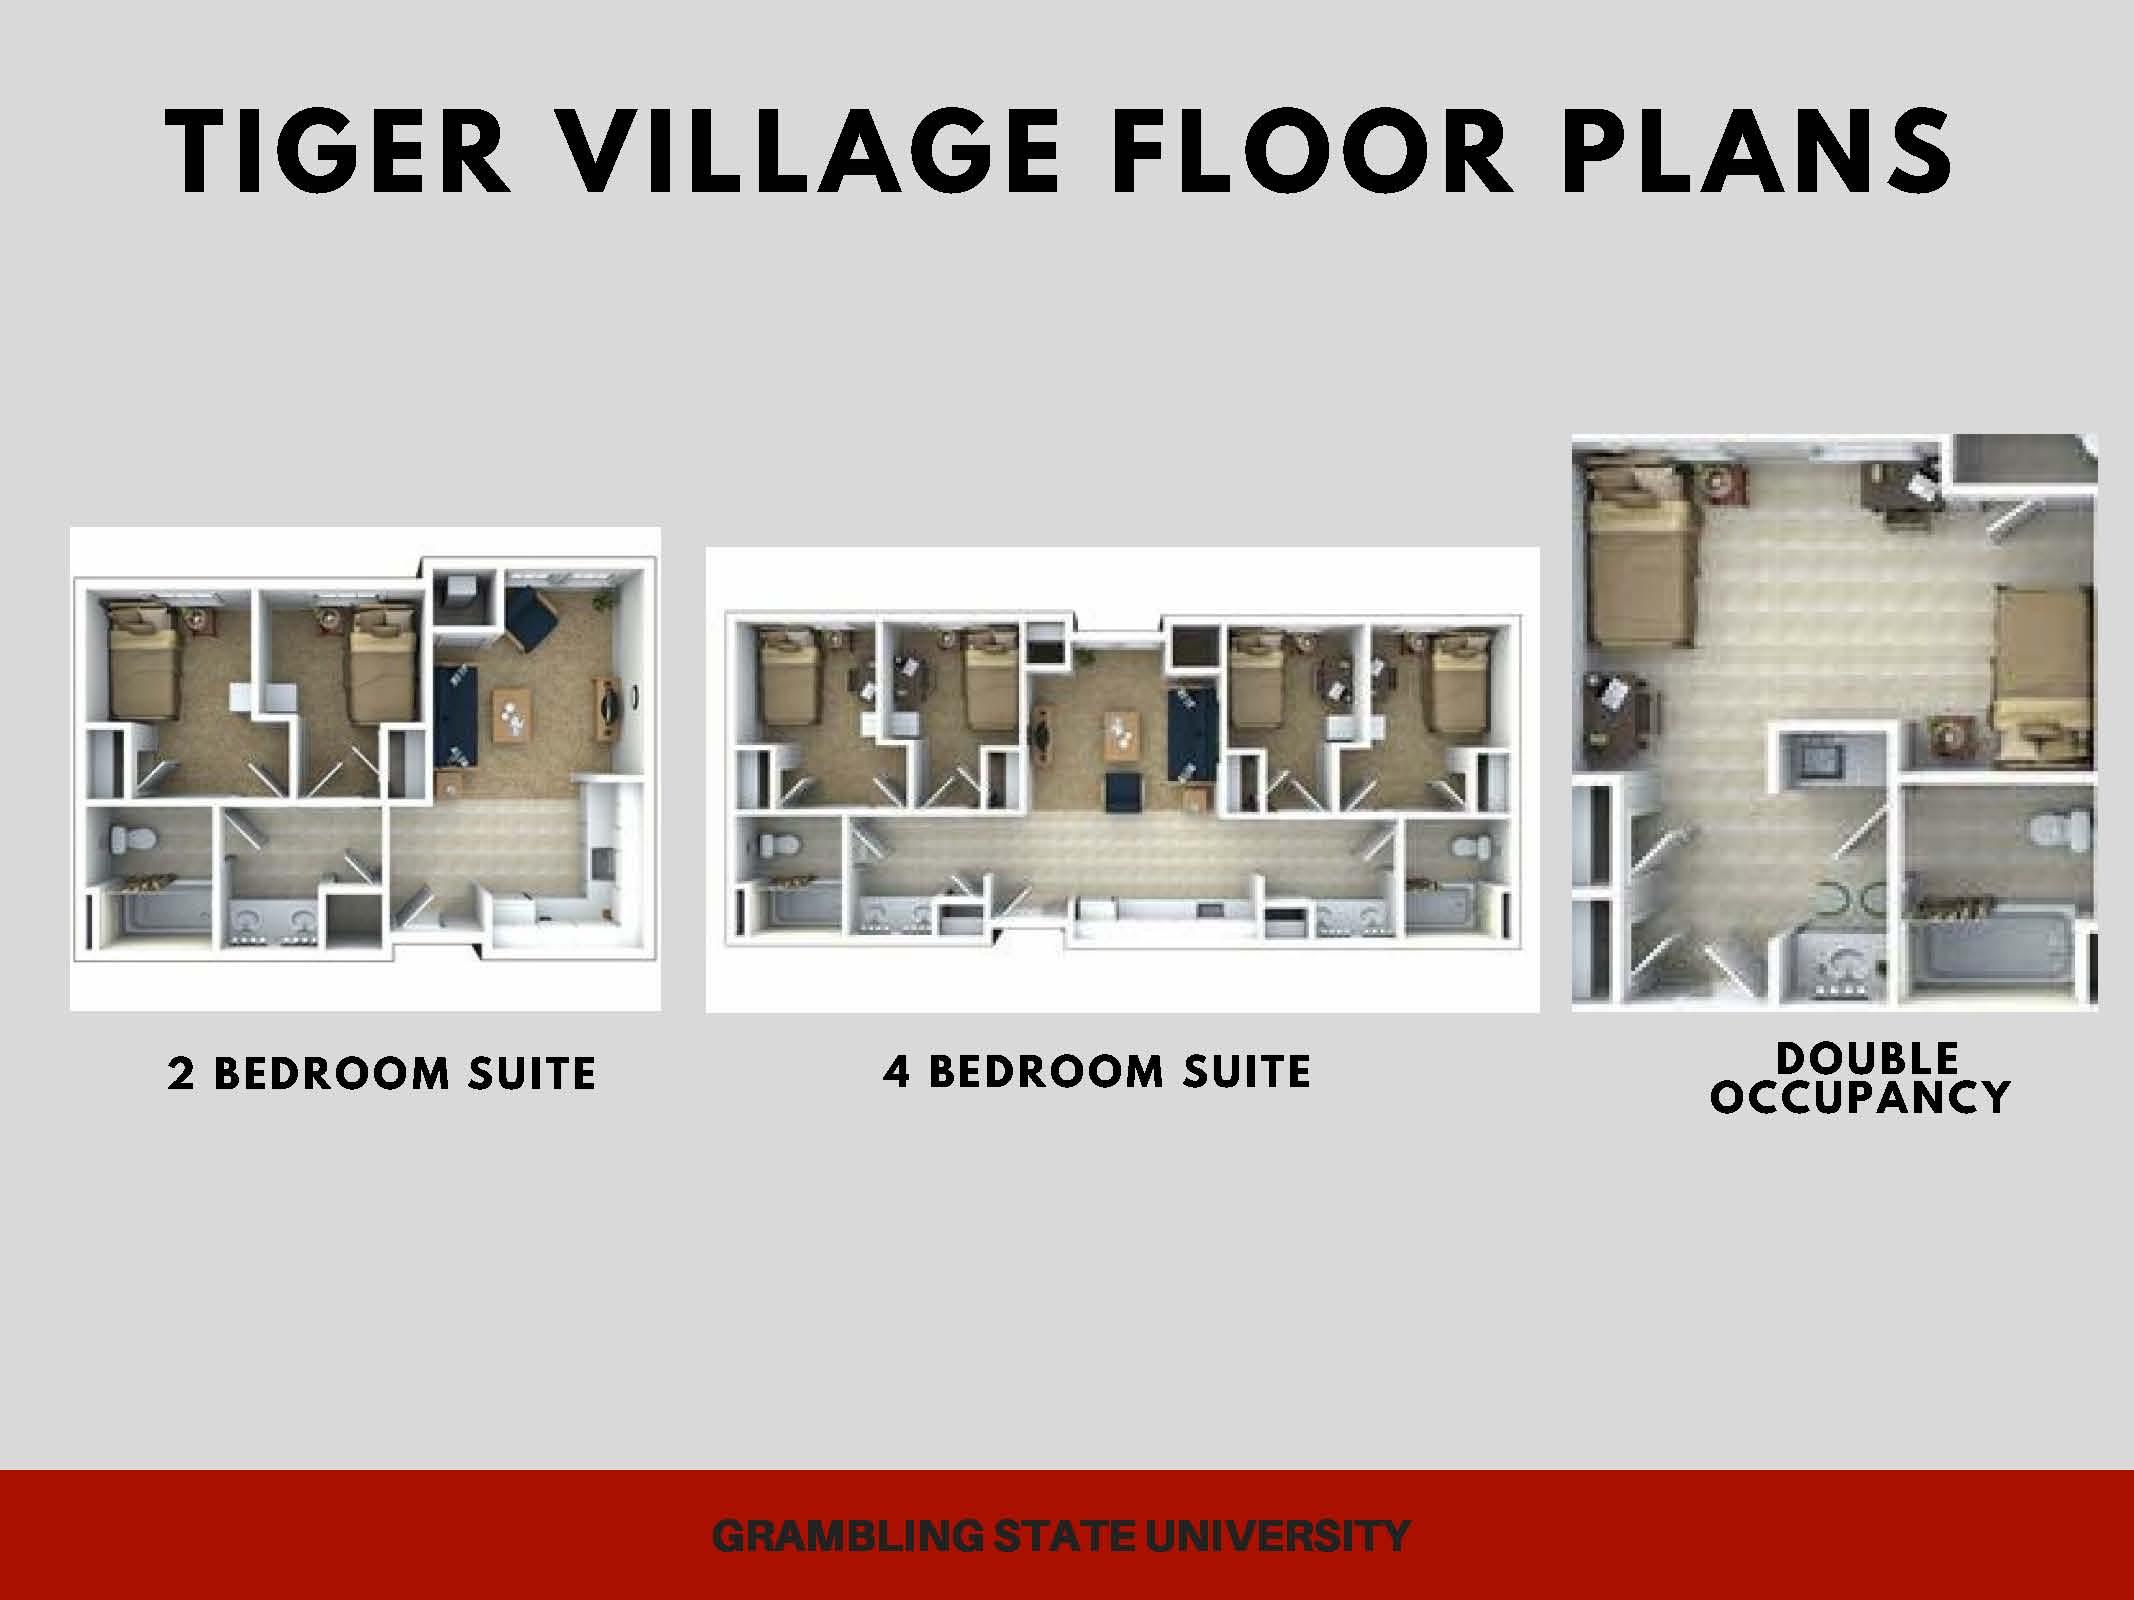 Tiger Village Floor Plans